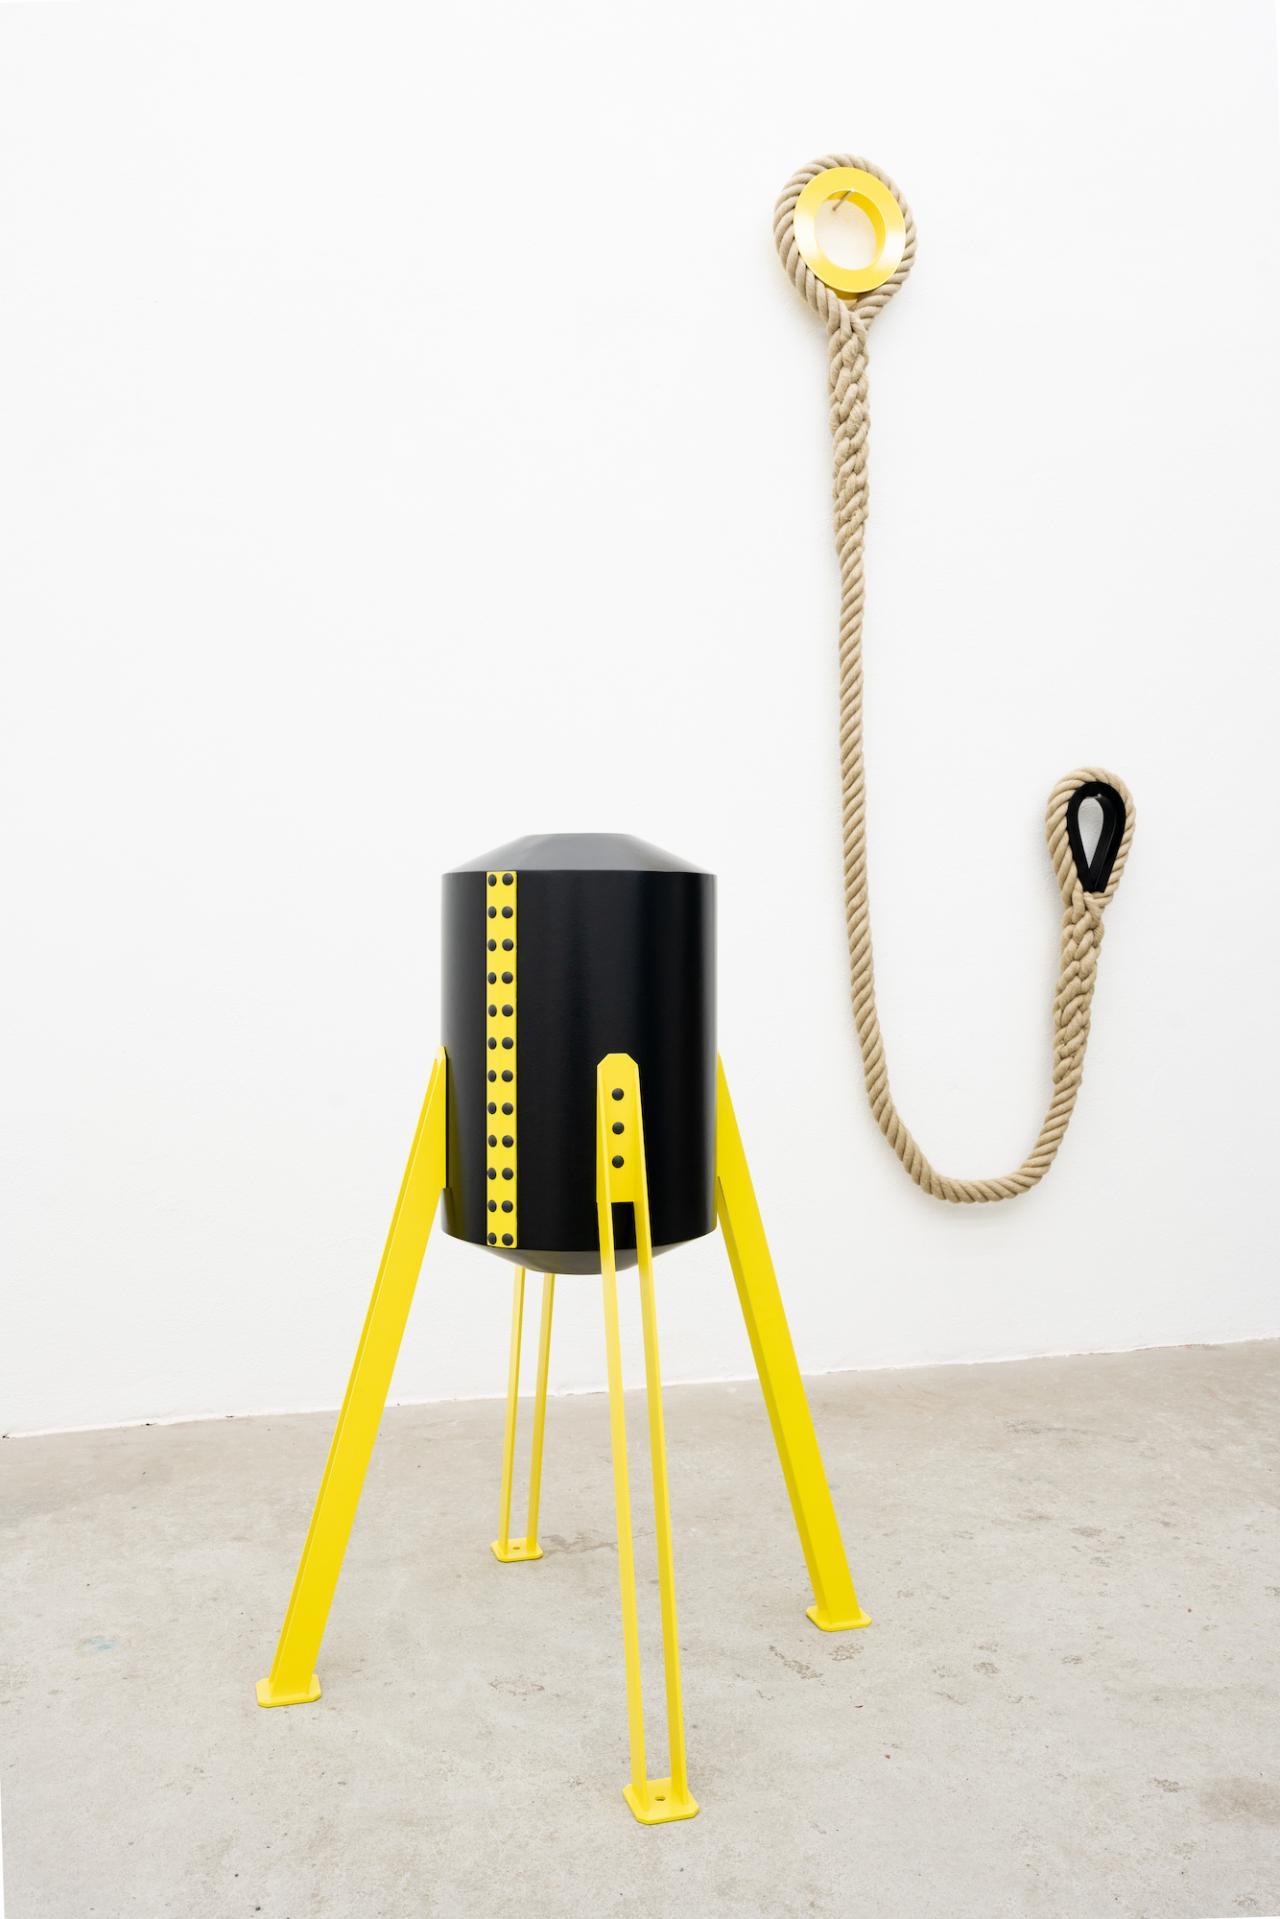 Eva Grubinger, right - Untitled (Petrischenko), 2018, Steel, hemp rope, ca. 220 × 90 × 10 cm left - Untitled (Petropawlowsk), 2018, Aluminum, Stainless steel, 112,5 × 87,5 × 87,5 cm, Copyright, courtesy Eva Grubinger und Galerie Tobias Naehring, Leipzig